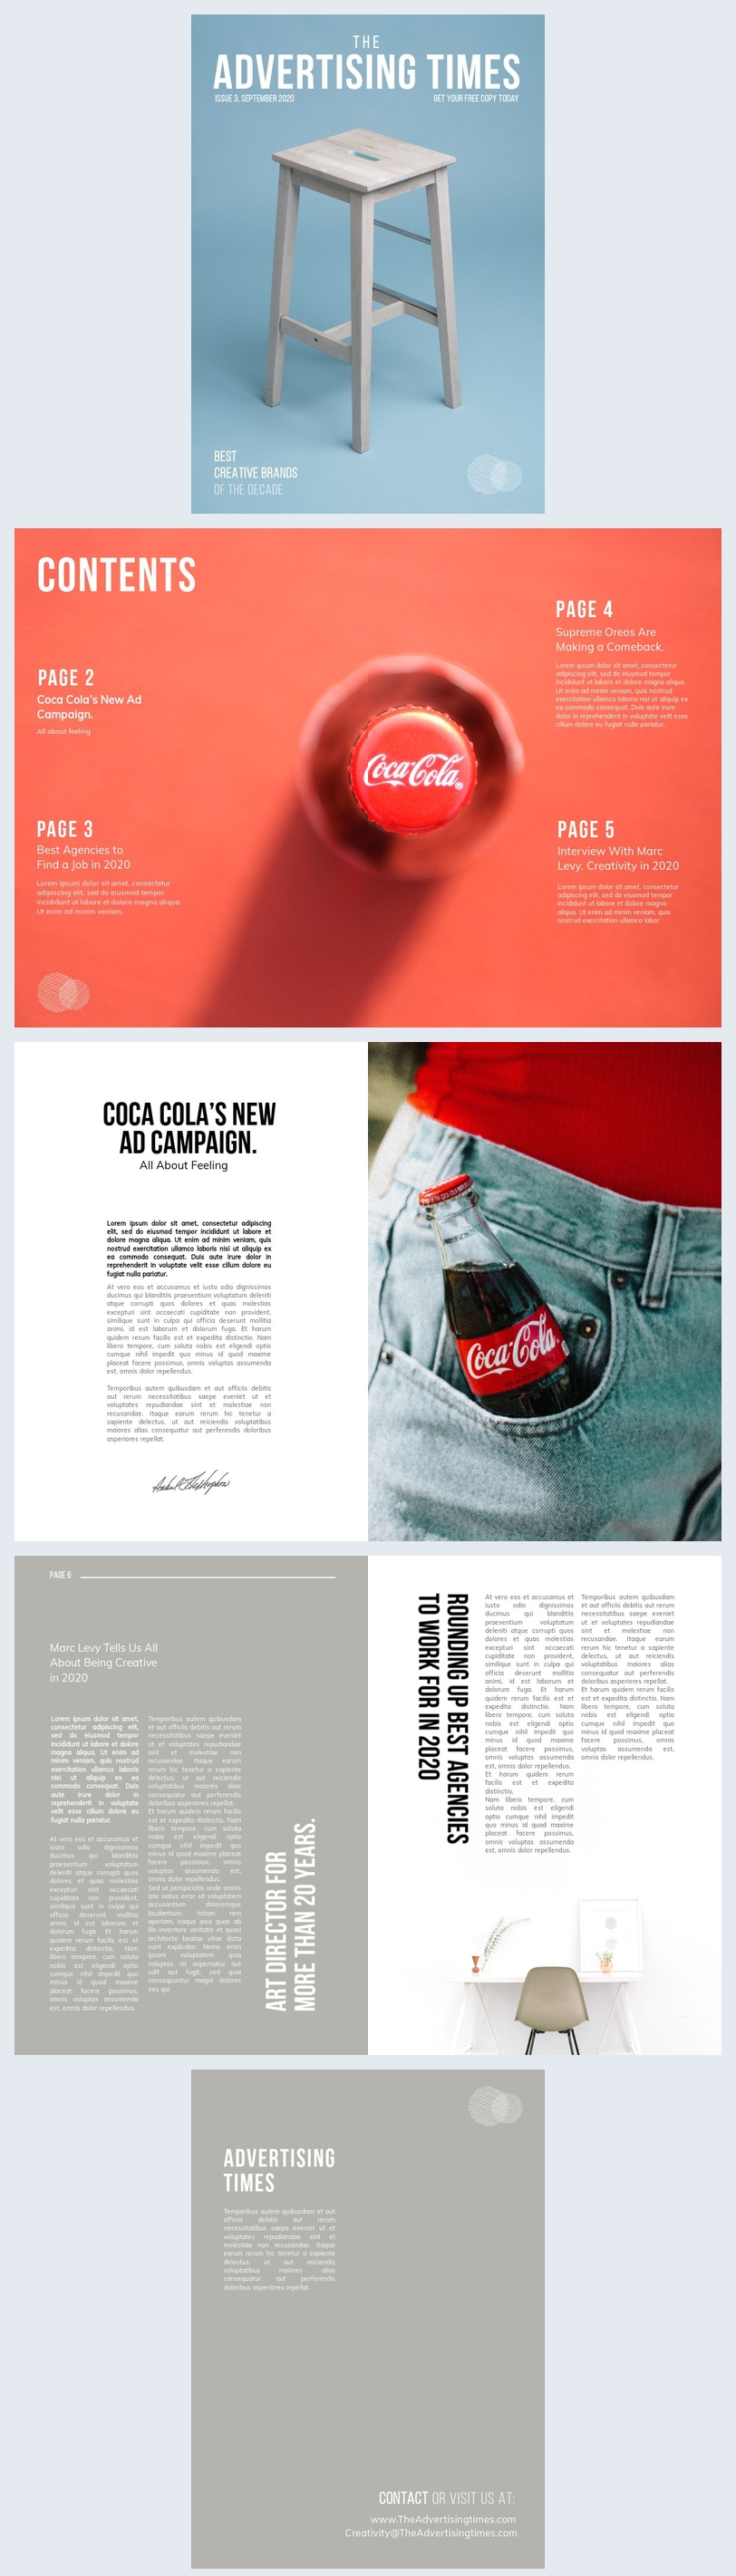 Design de layout de revista de publicidade